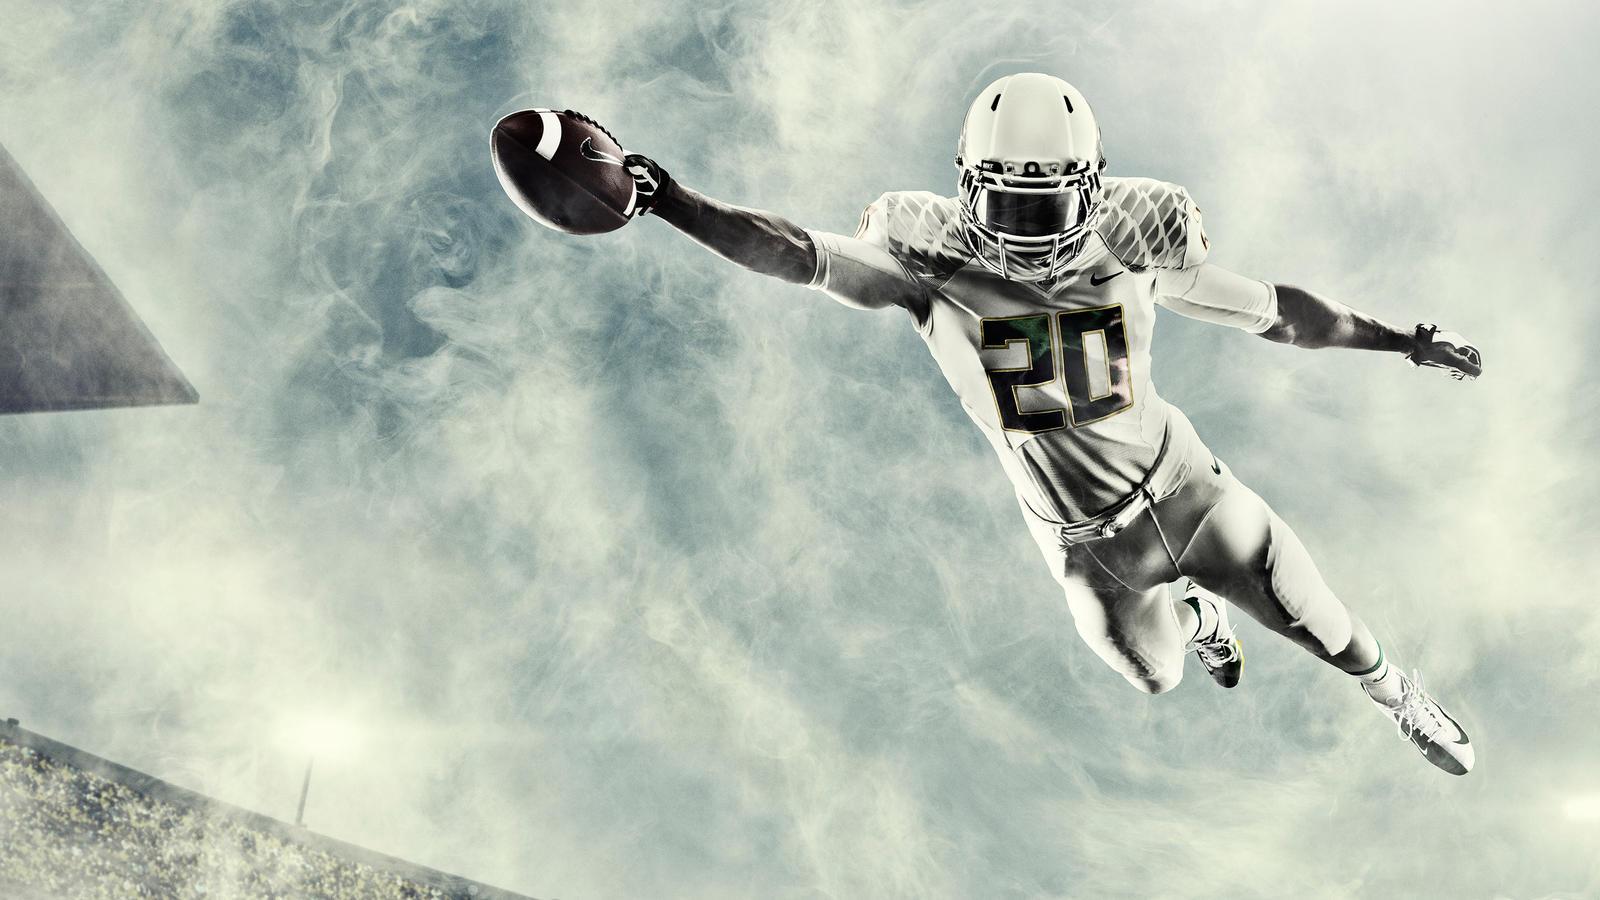 Nike football wallpaper 2013